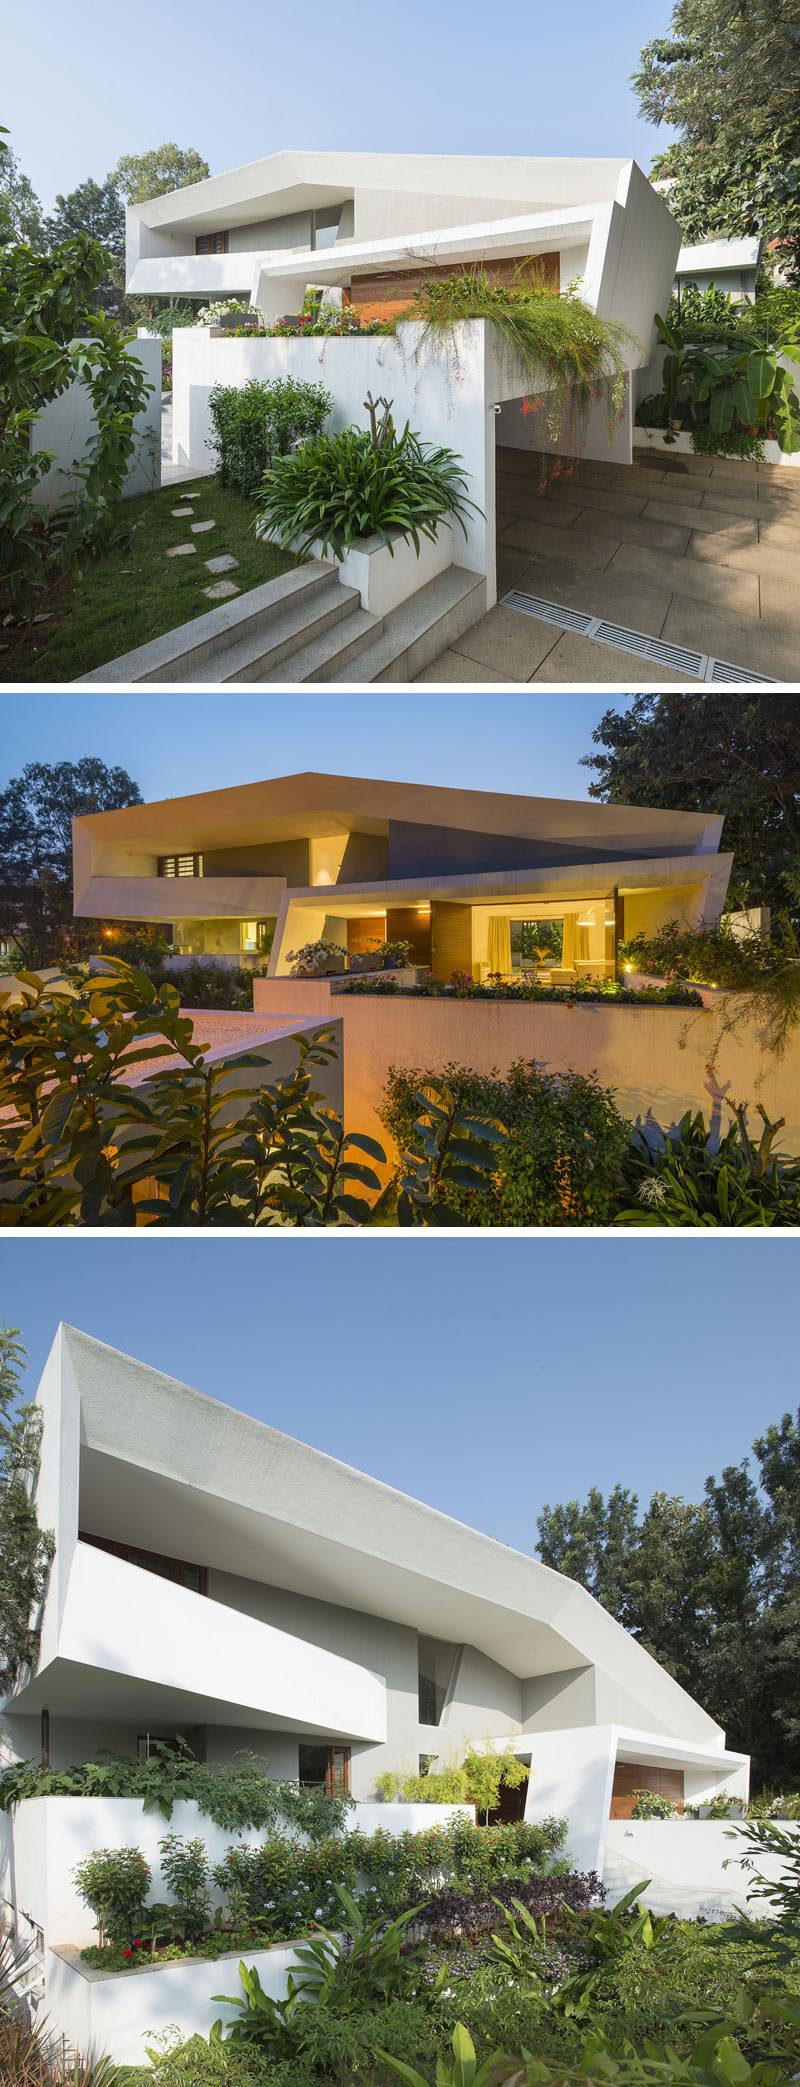 modern house design 121216 1144 02